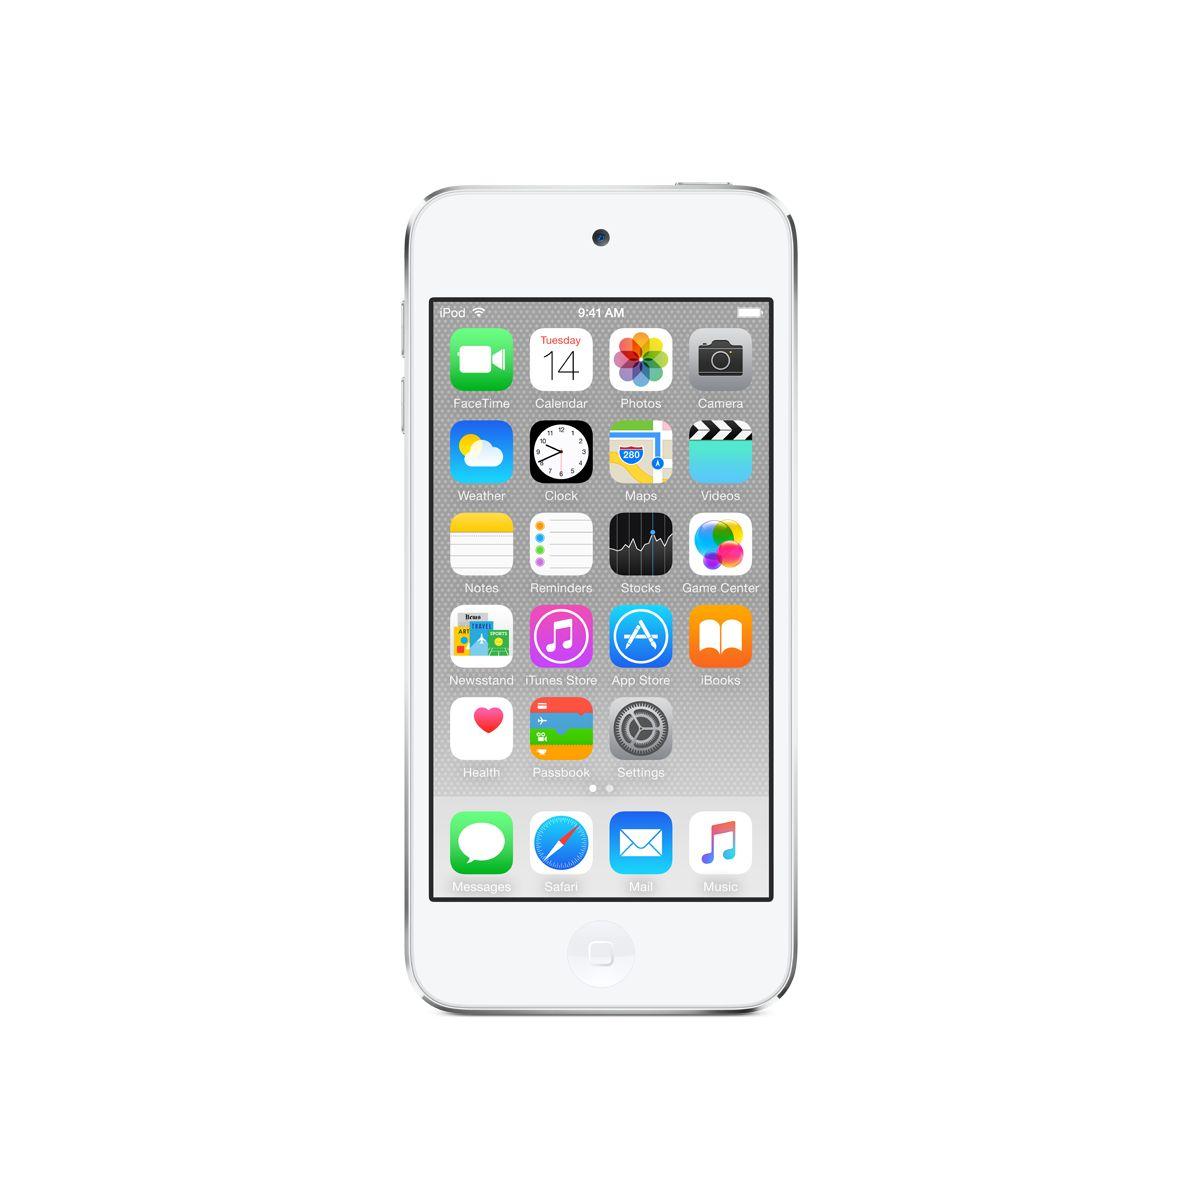 Bal.mp4 apple ipod touch 32 go blanc et - livraison offerte : code livrelais